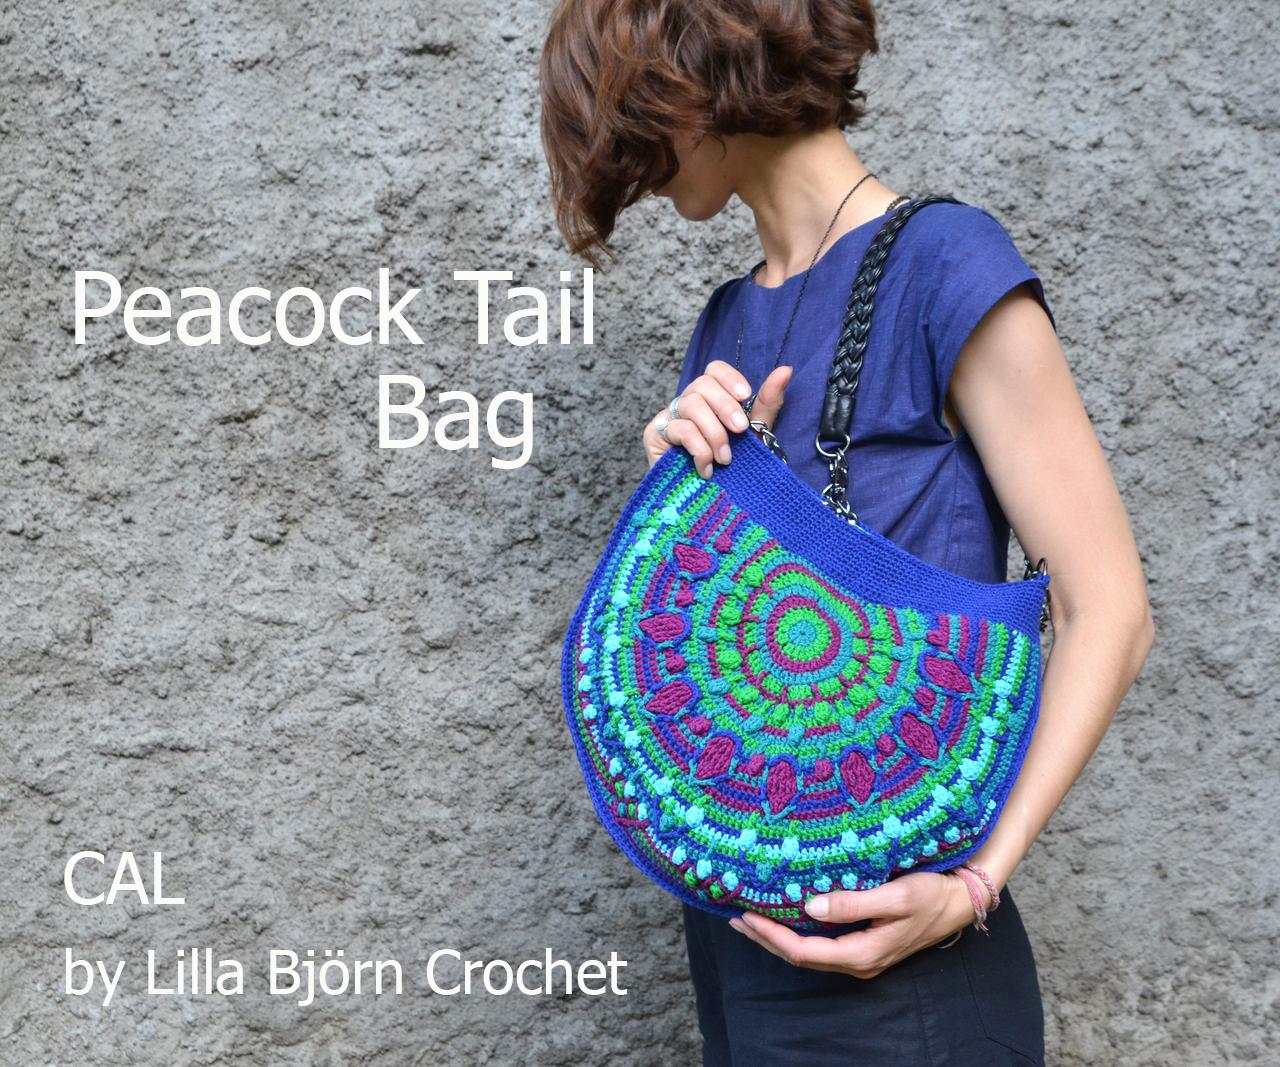 Peacock Tail Bag. CAL in overlay crochet. Original design by Lilla Bjorn Crochet